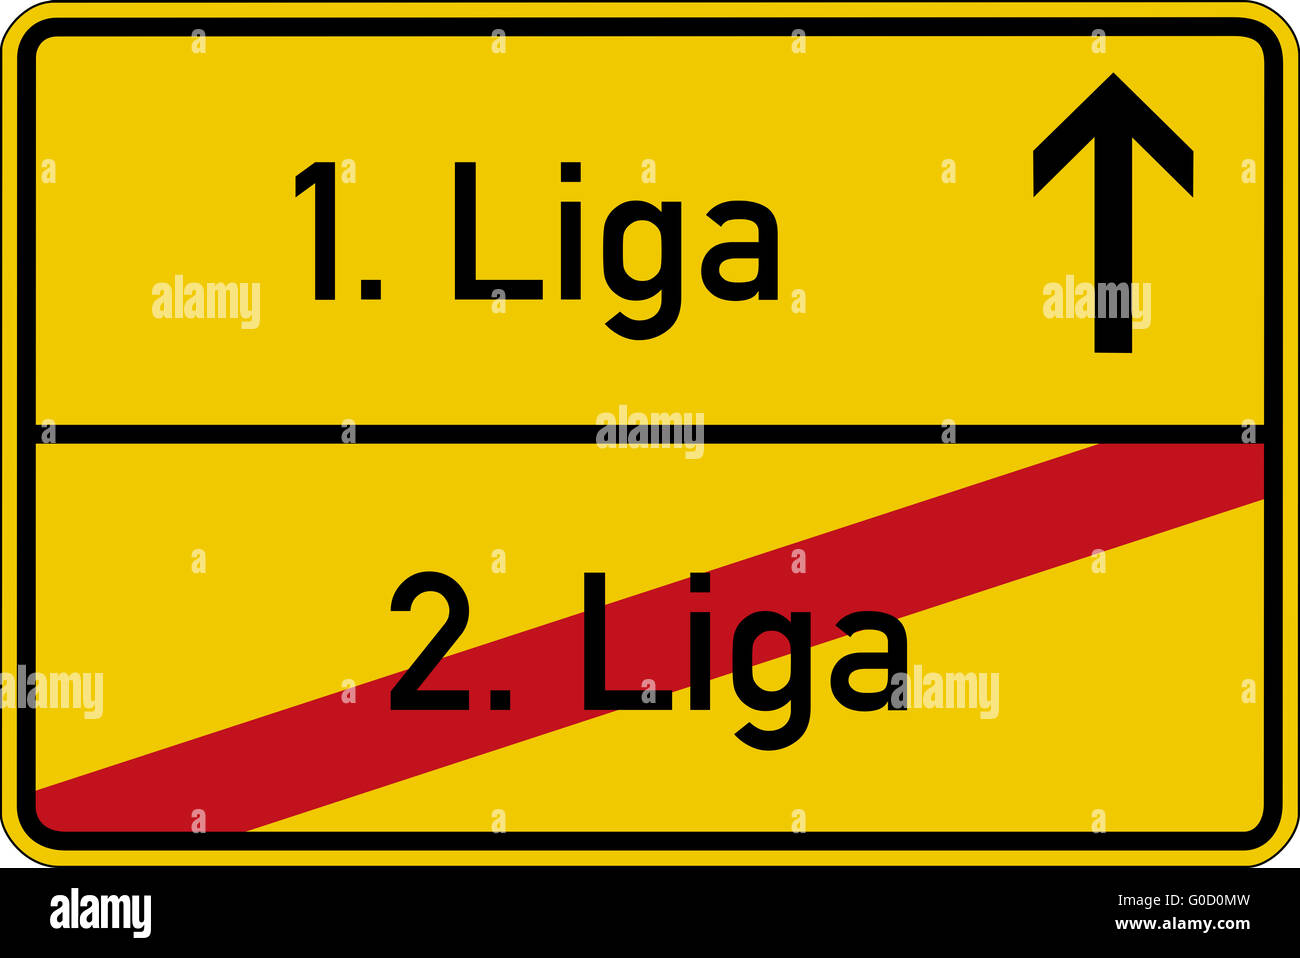 1. league and 2. league - Stock Image